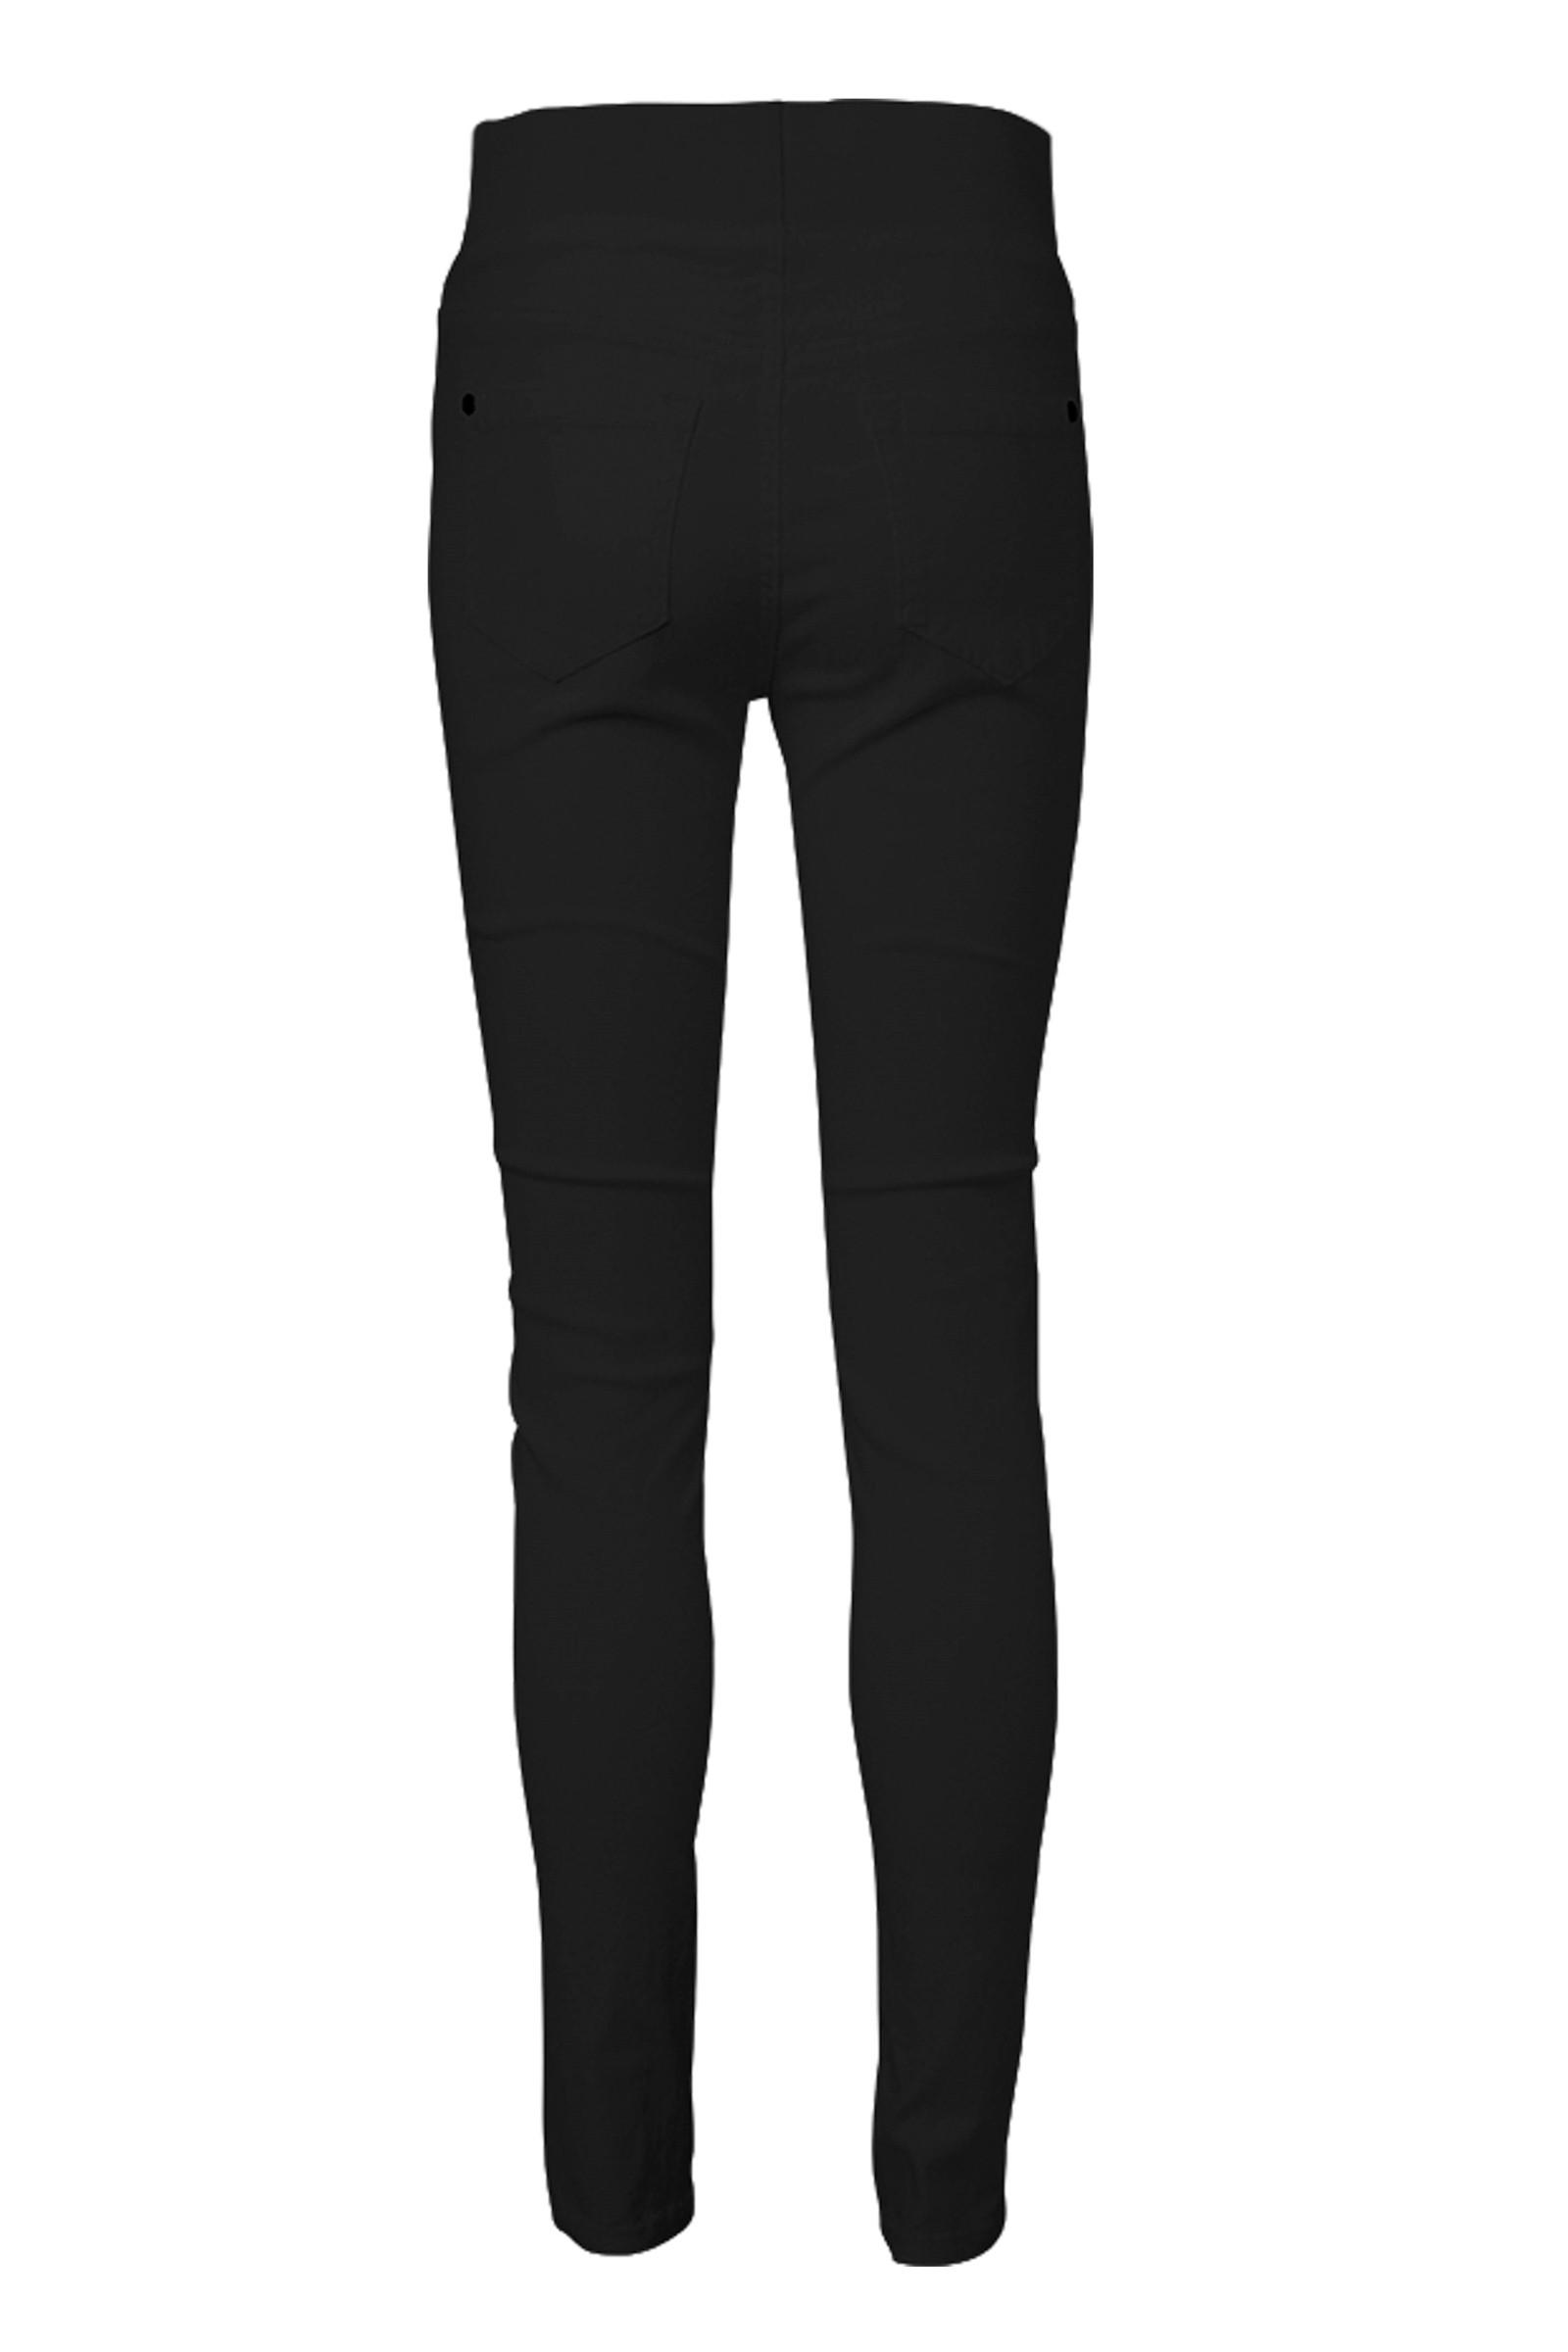 SHANTAL PA POWER SORT bukser fra Freequent Køb bukser online her